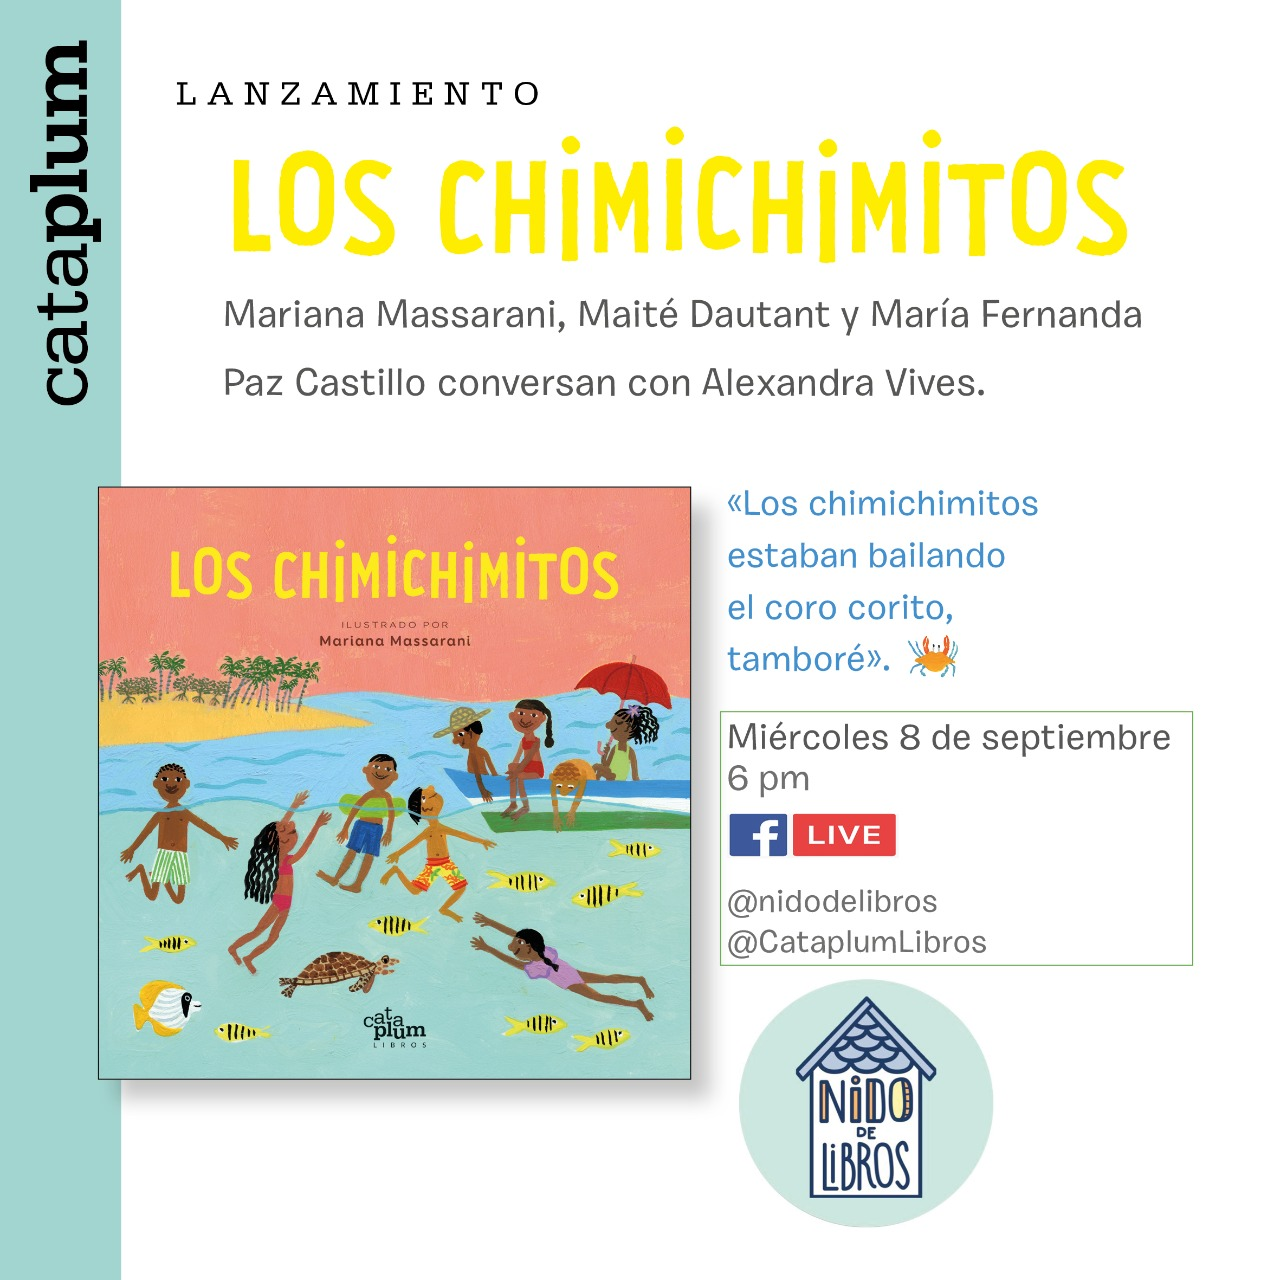 chimichimitos live